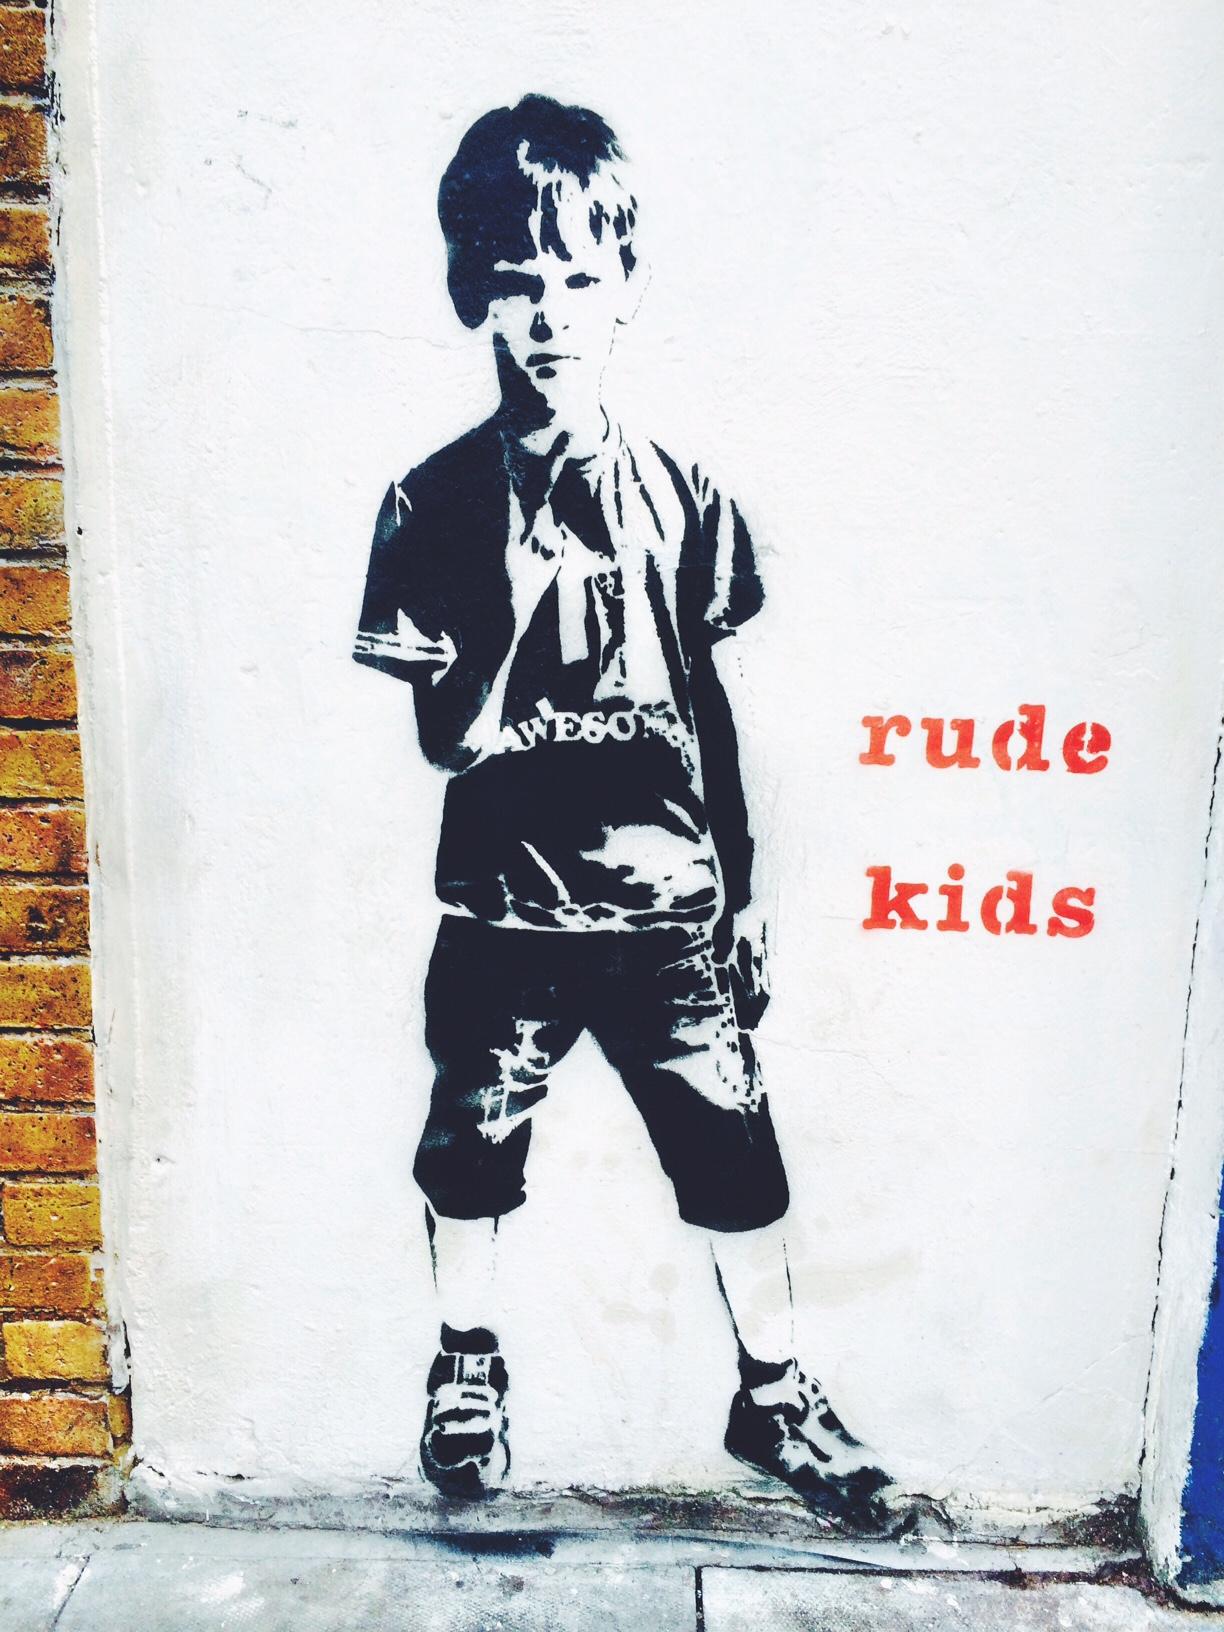 rude kids graffiti redchurch street